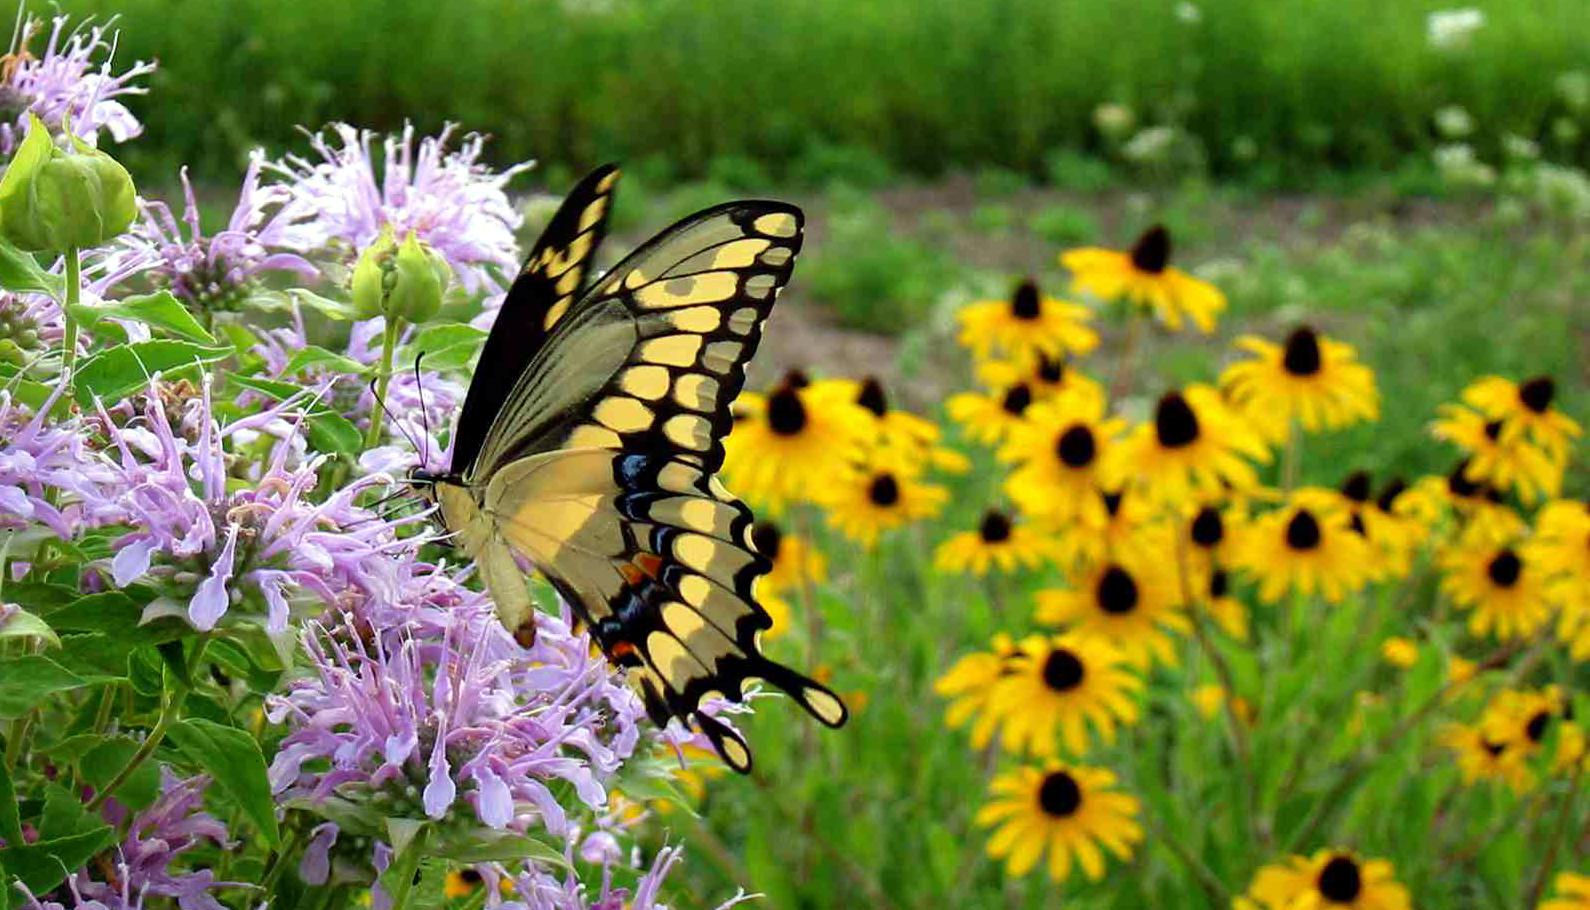 Aejeco curso de jardiner a ecol gica y dise o de bosques for Jardineria ecologica